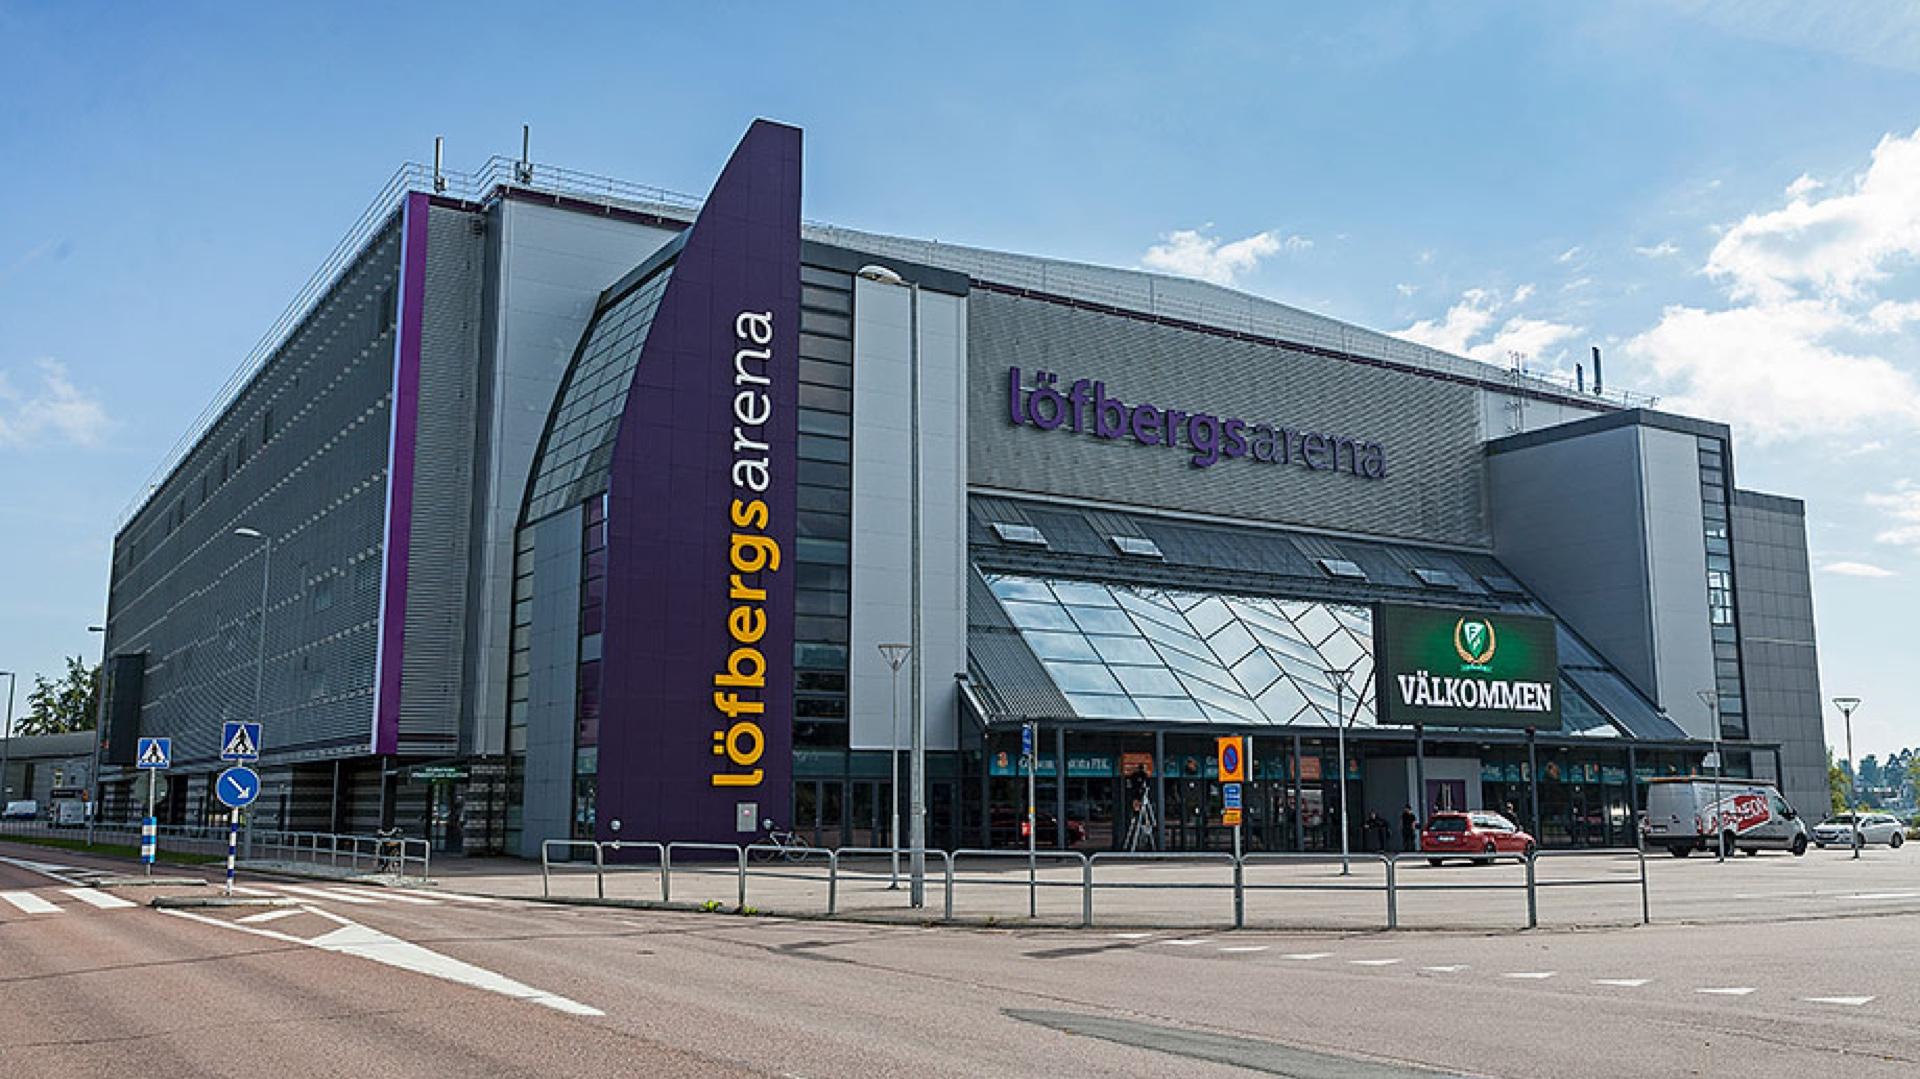 Reference Löfbergs arena